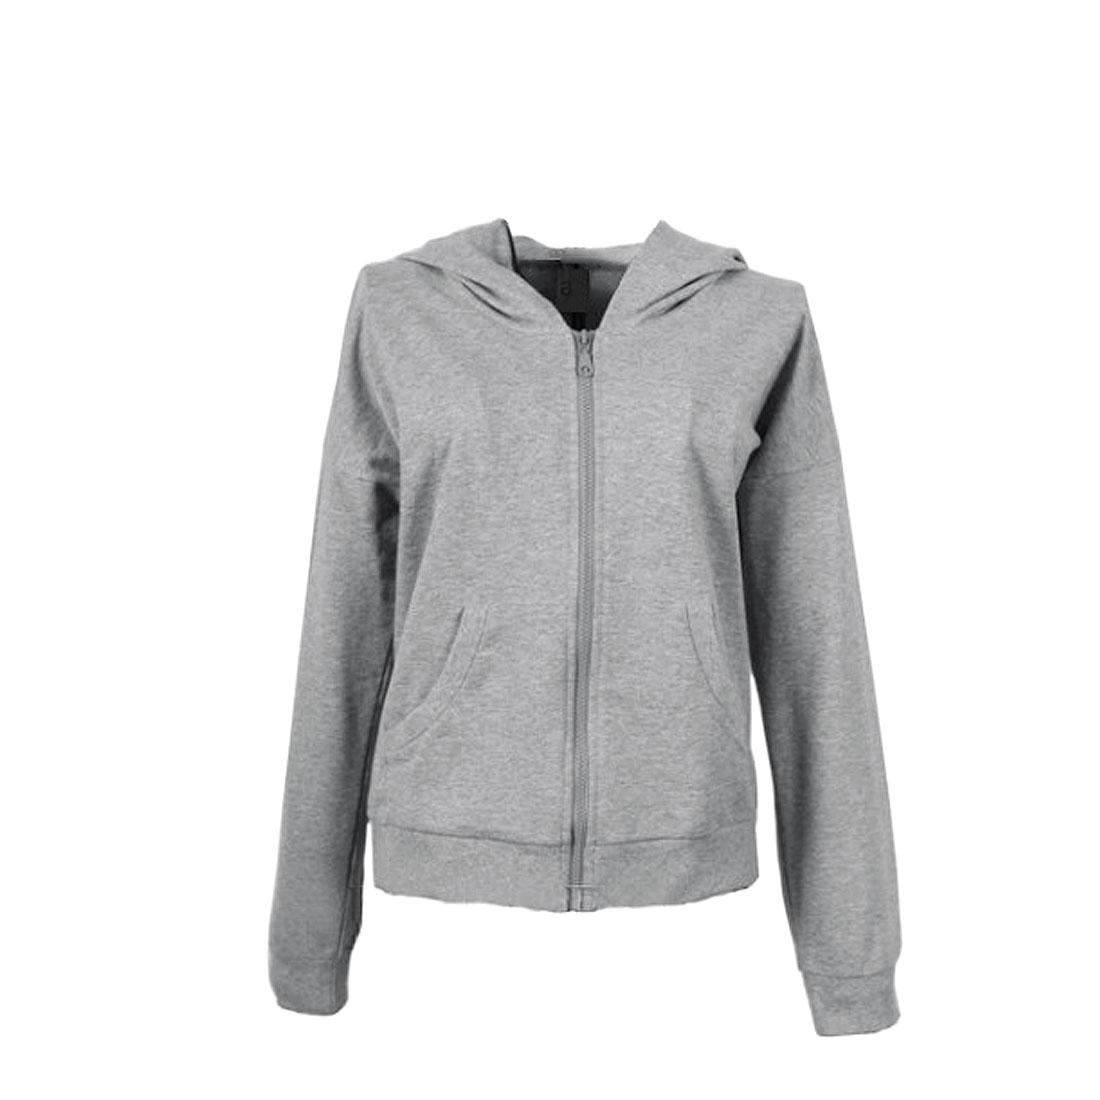 Men Light Grey M Long Sleeve Zip Closure Solid Color Wings Back Jacket